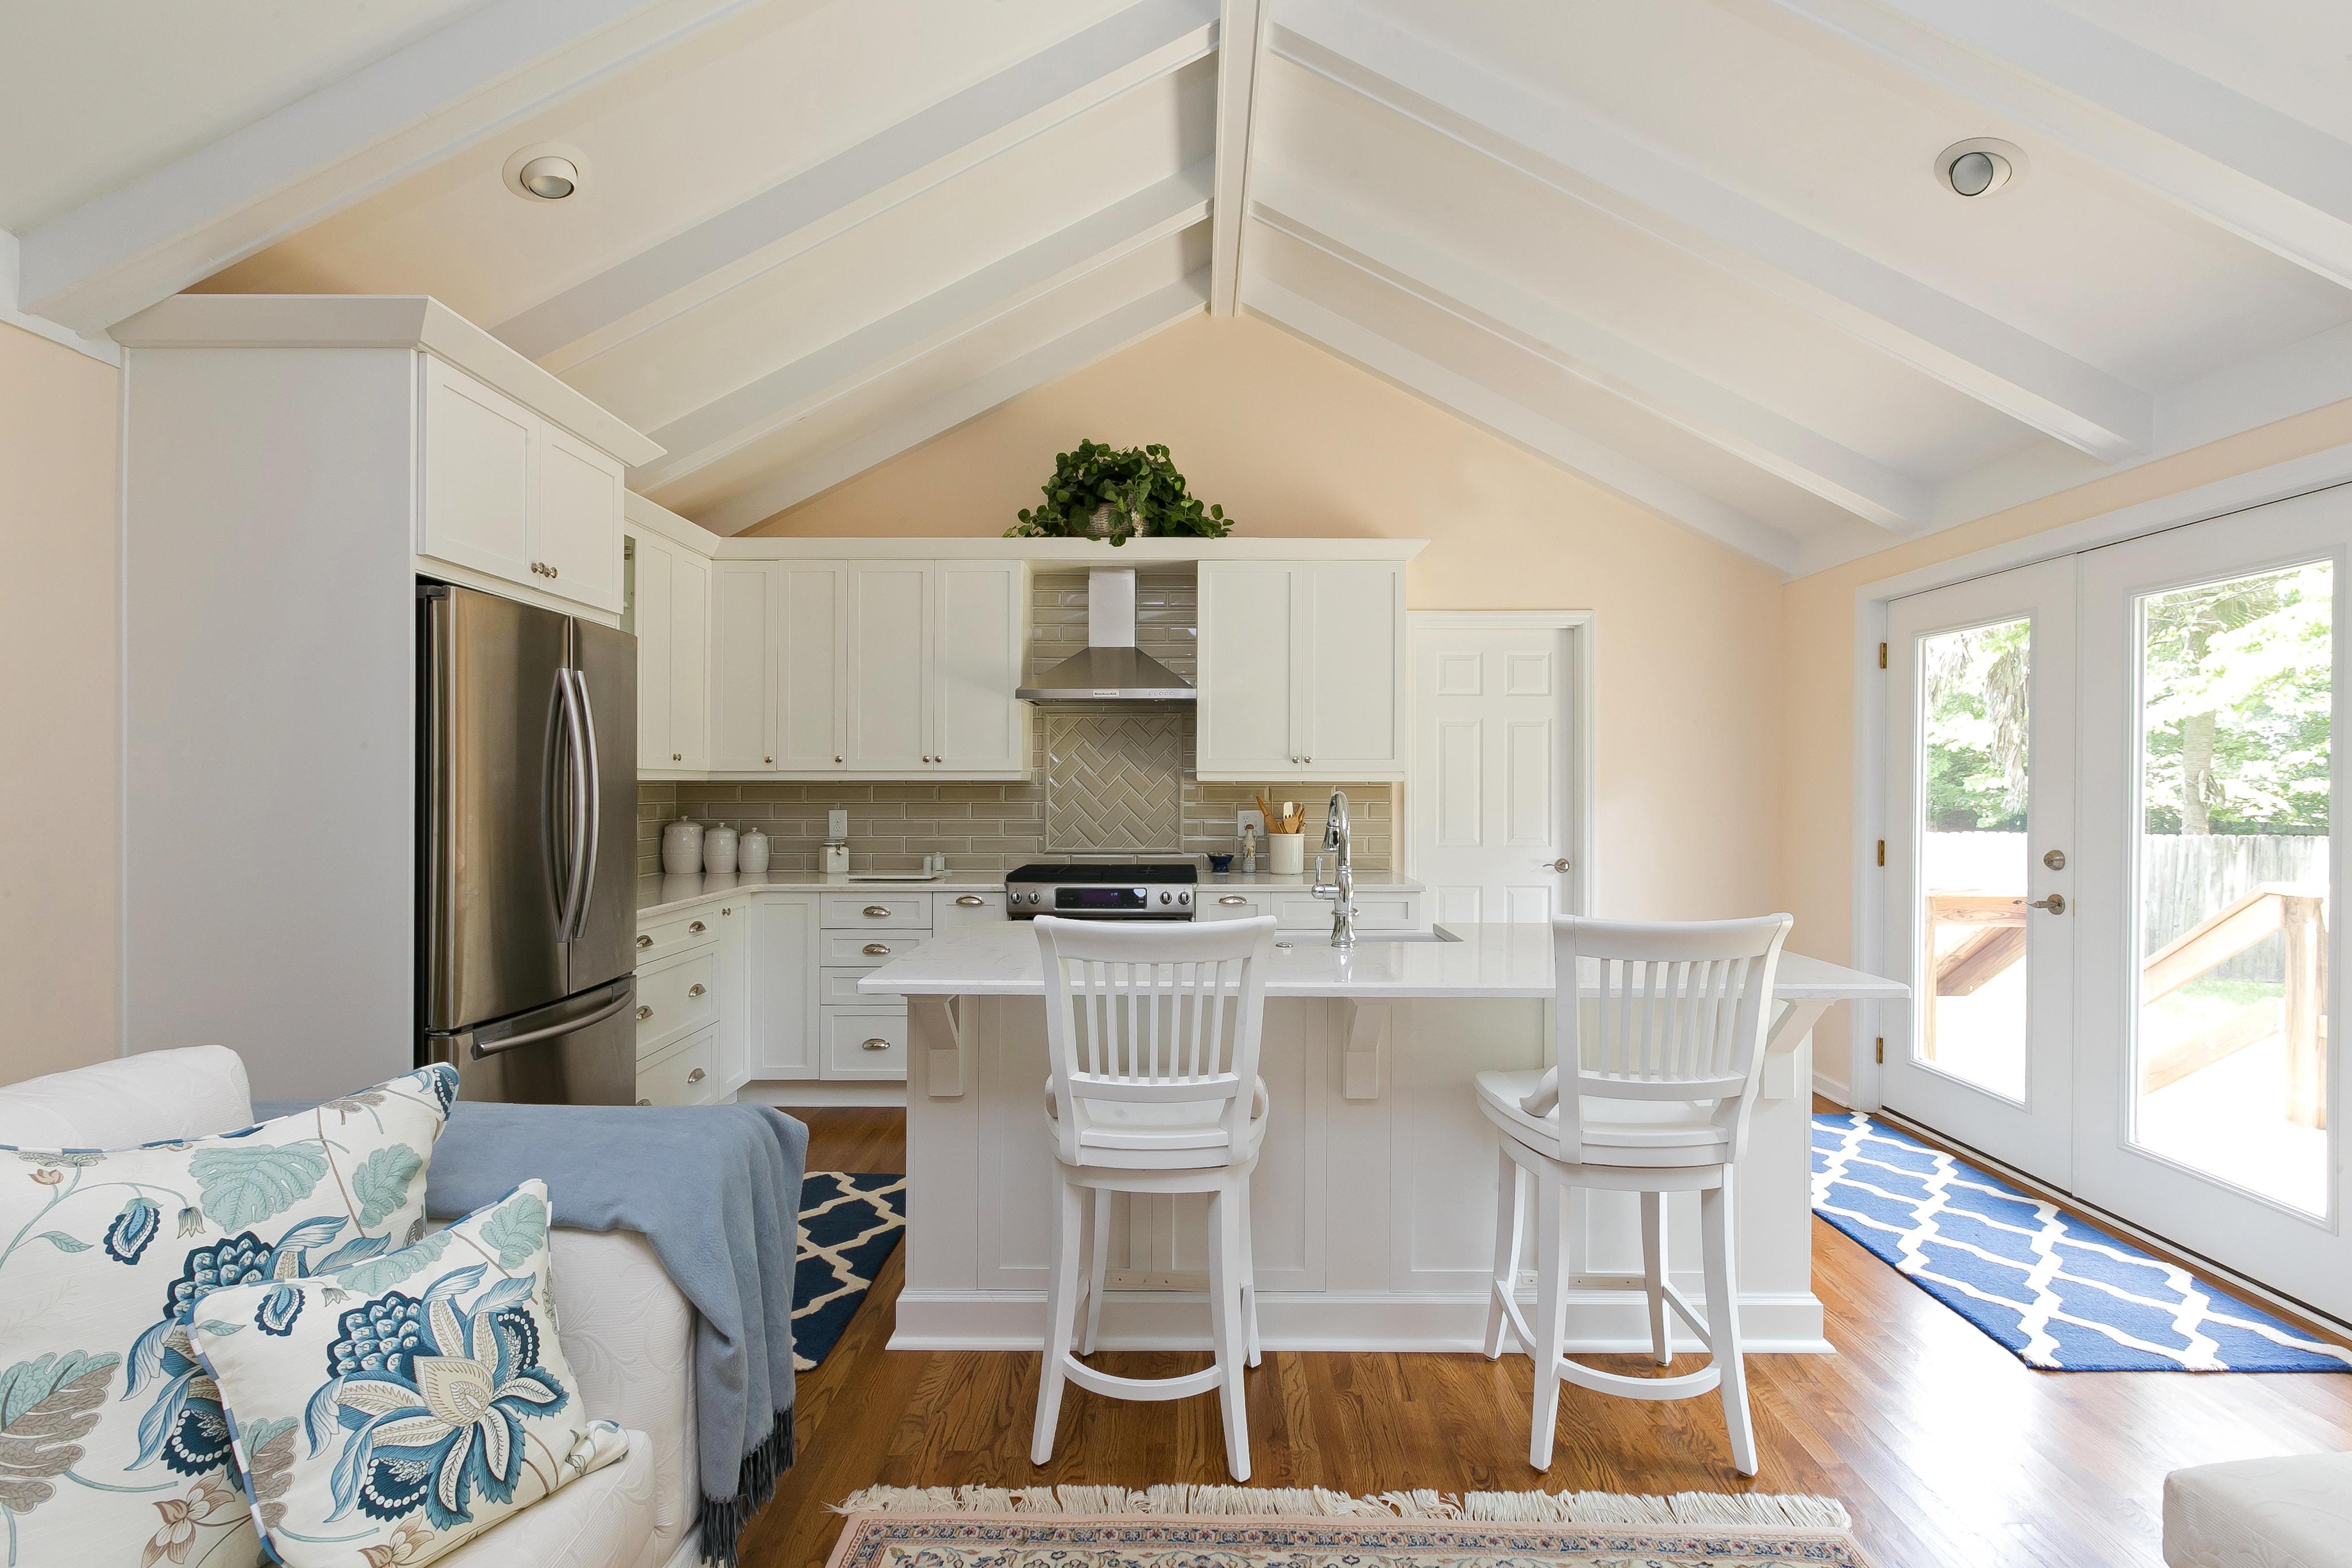 Southeast Kitchens image 3